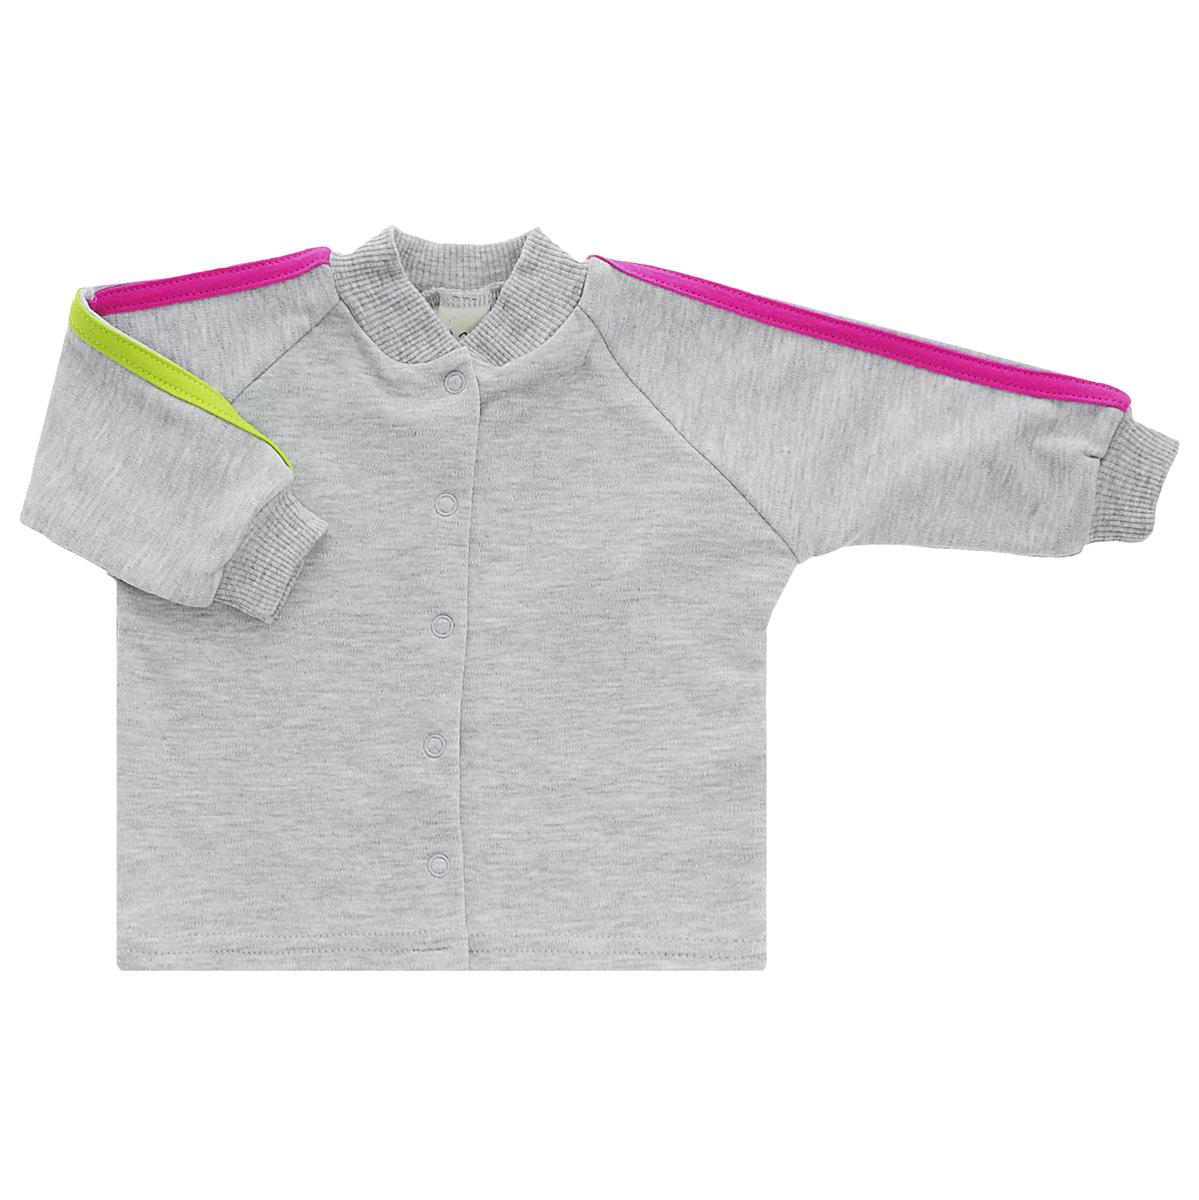 Кофточка детская Lucky Child, цвет: серый, розовый. 1-16. Размер 74/80